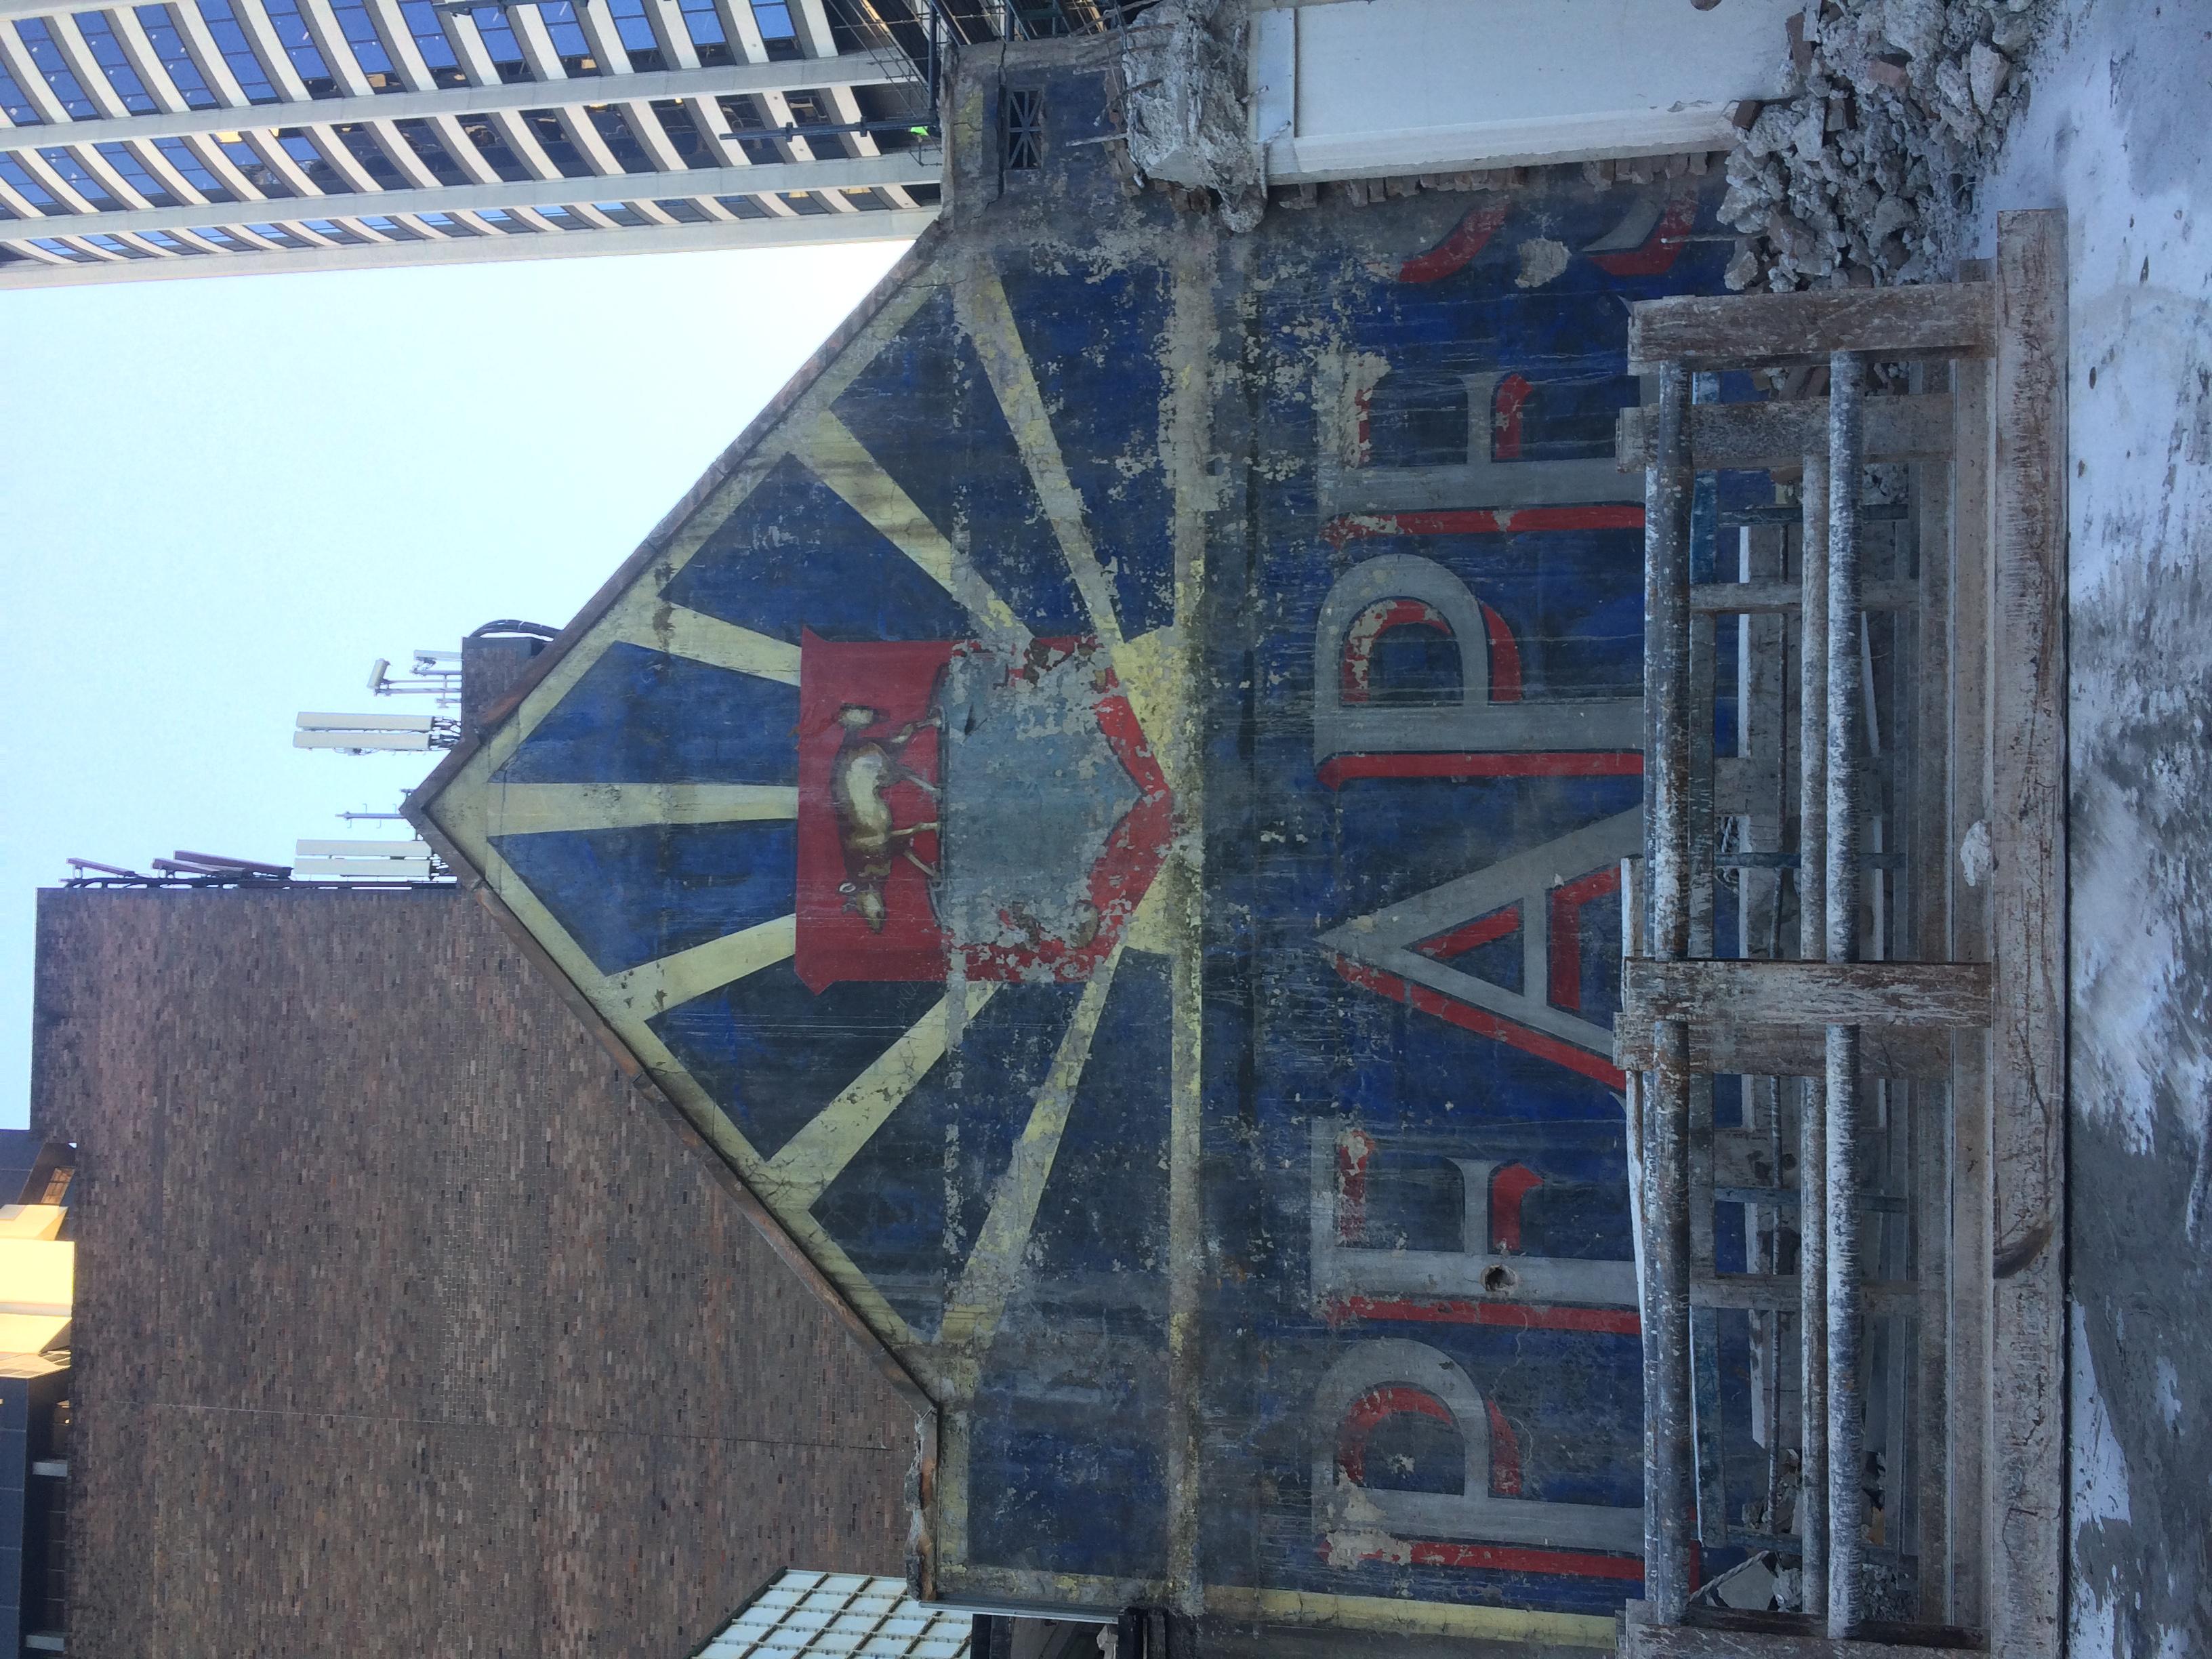 Tower 285 George PEAPS Signage 2